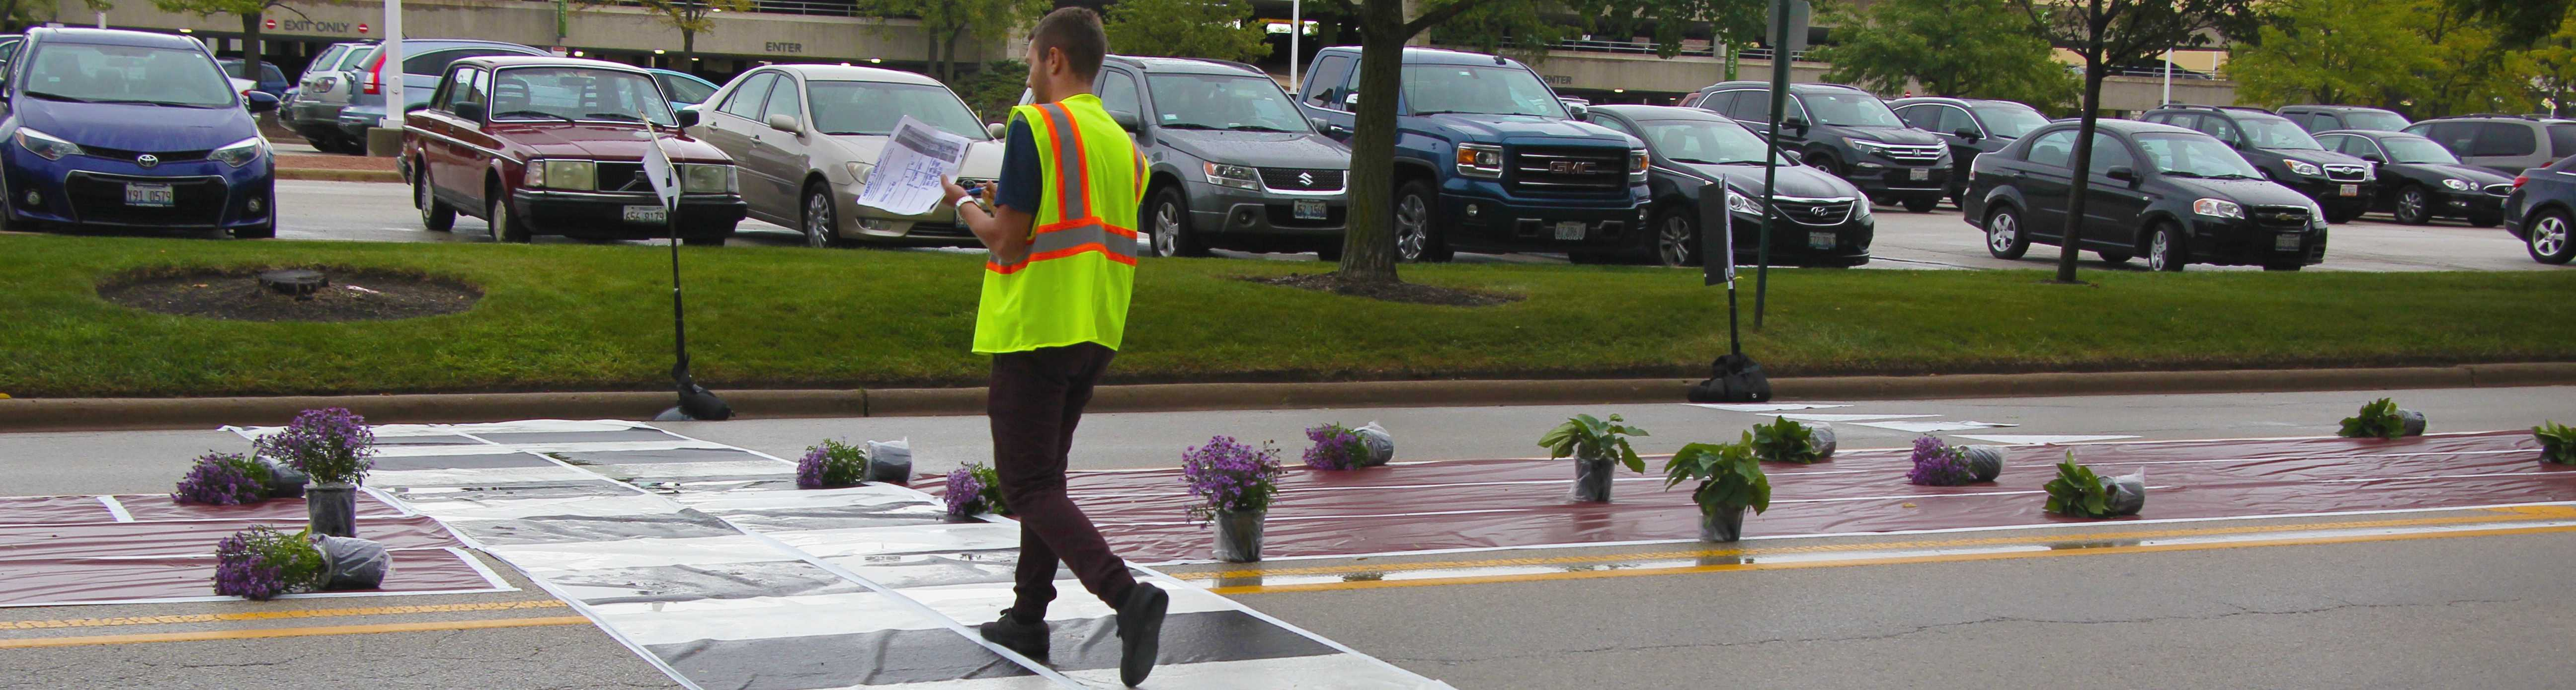 Active Transporation Alliance is making Skokie's streets smart